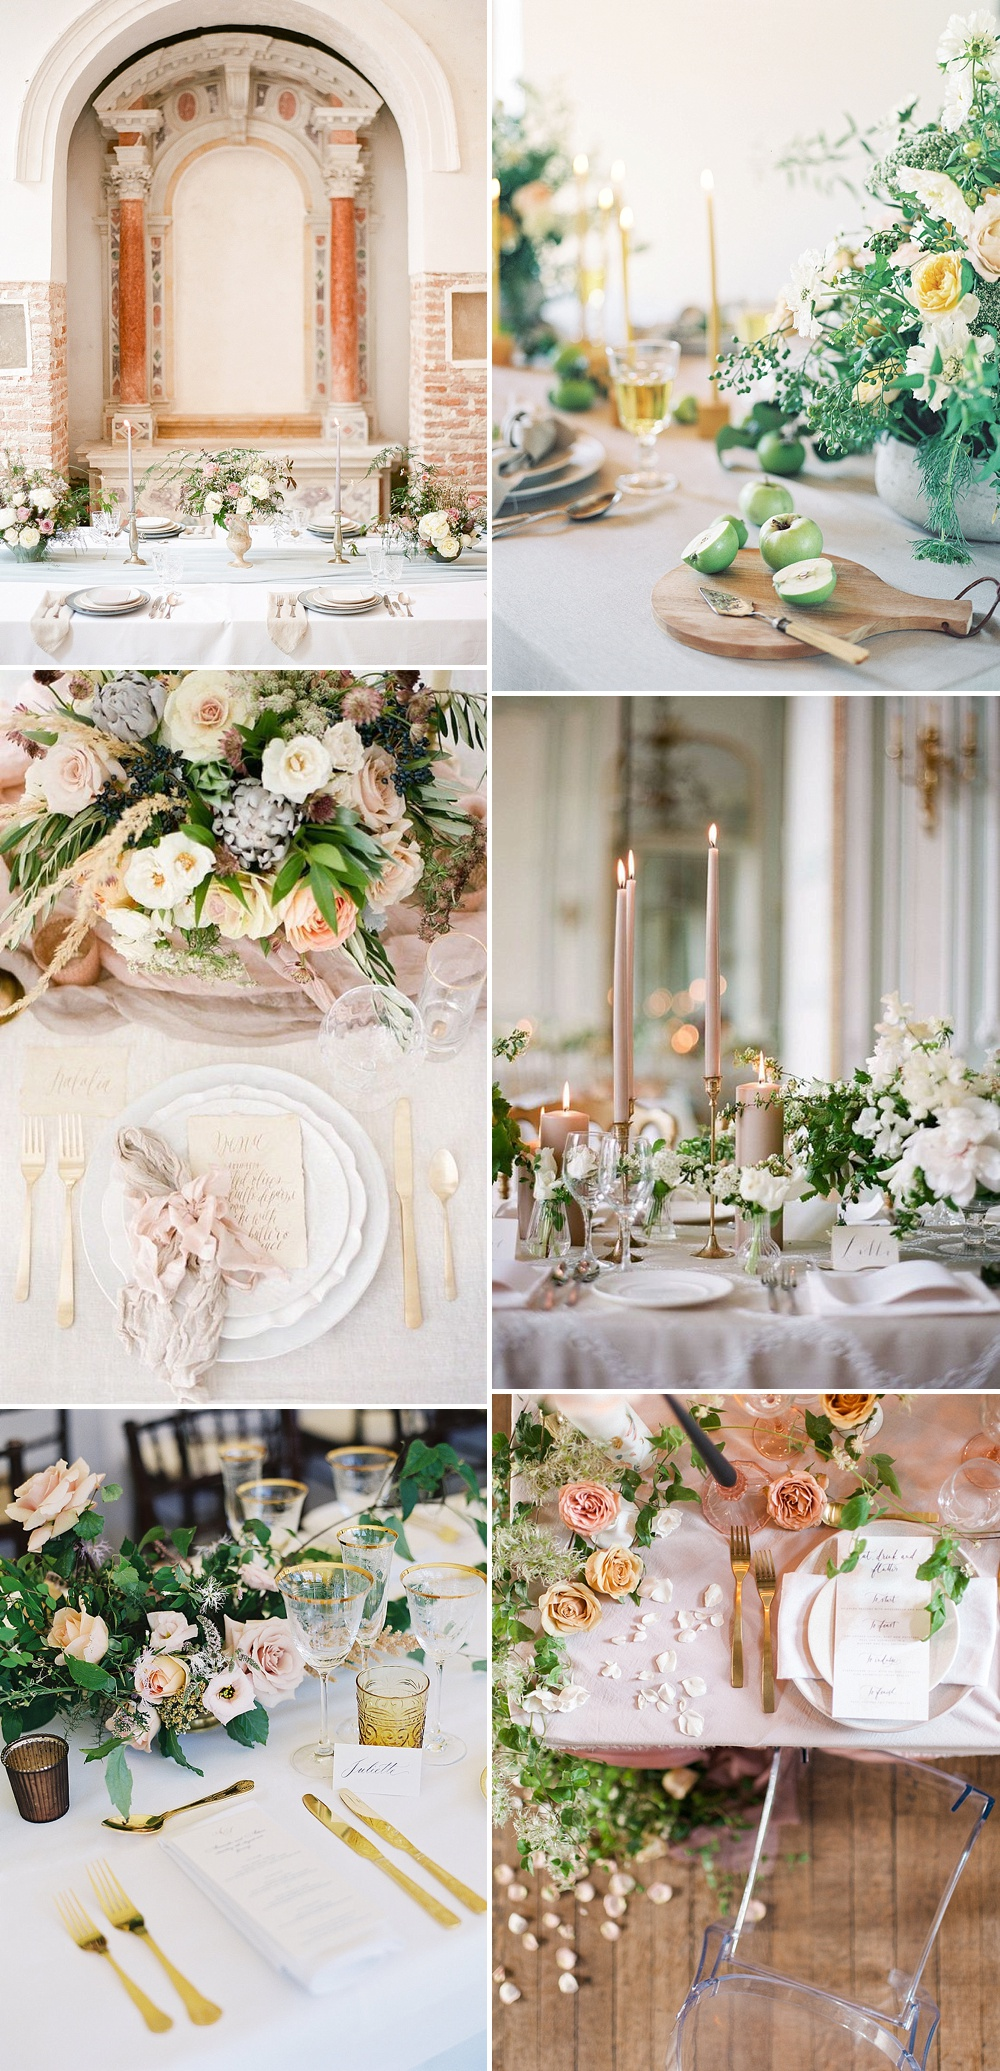 Romantic and Feminine Blush Pink & Gold Summer Wedding Place Setting Inspiration